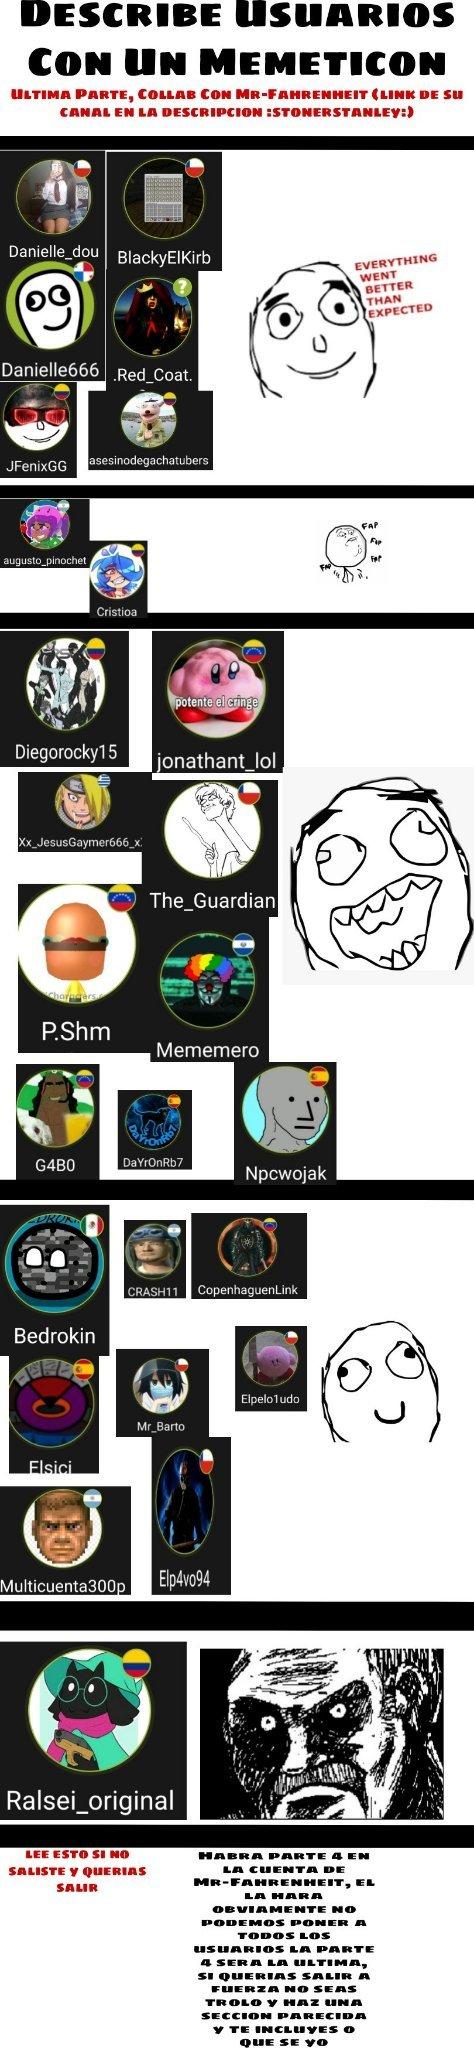 Parte 4 Proximamente, Mr-Fahrenheit lo subira; lean el texto de abajo - meme